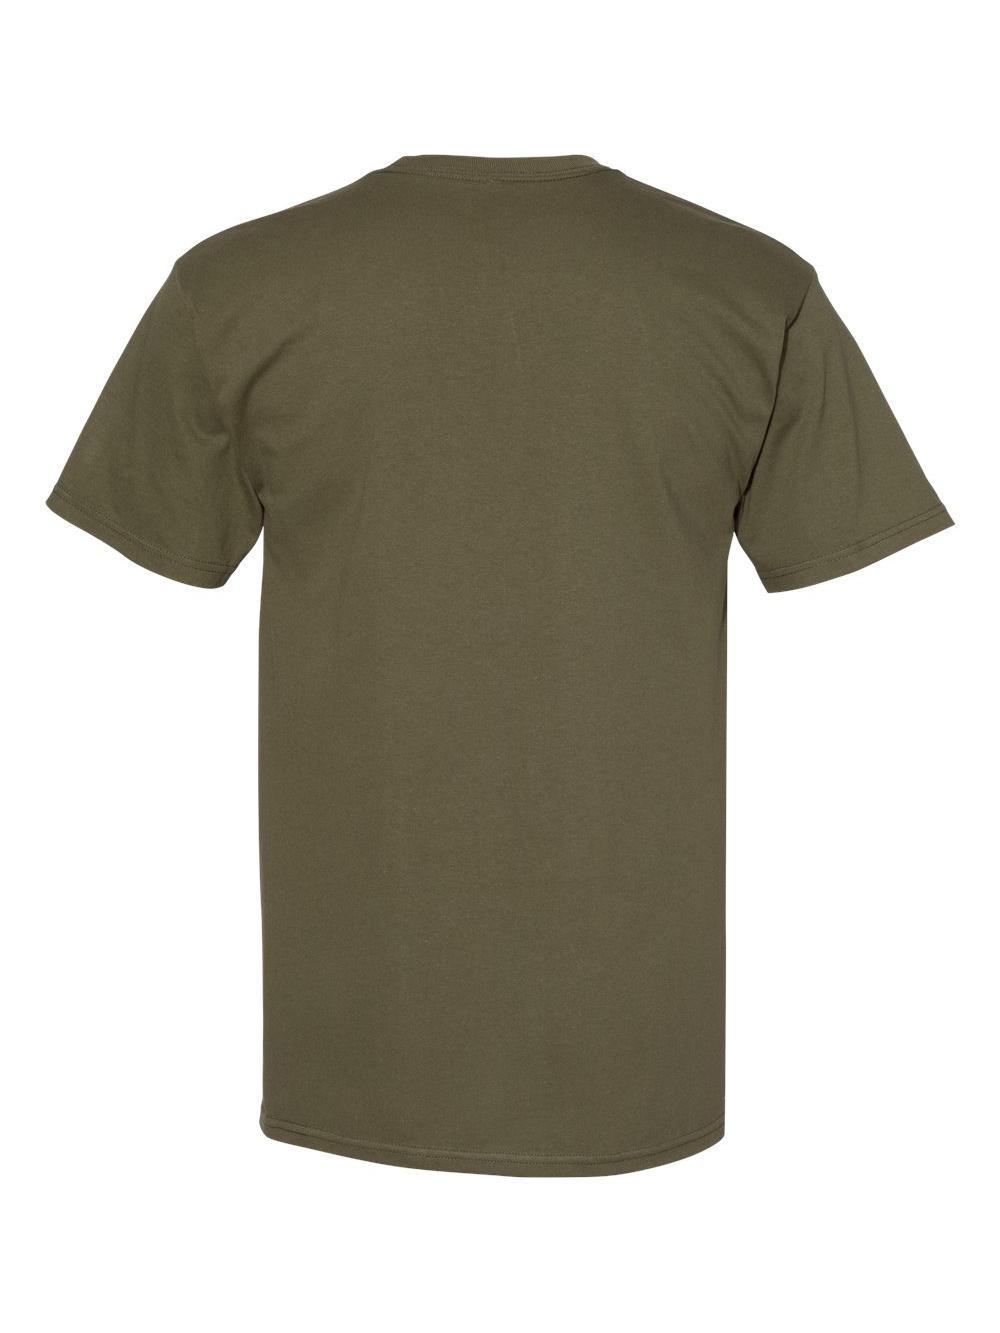 ALSTYLE-Premium-T-Shirt-1701 thumbnail 34